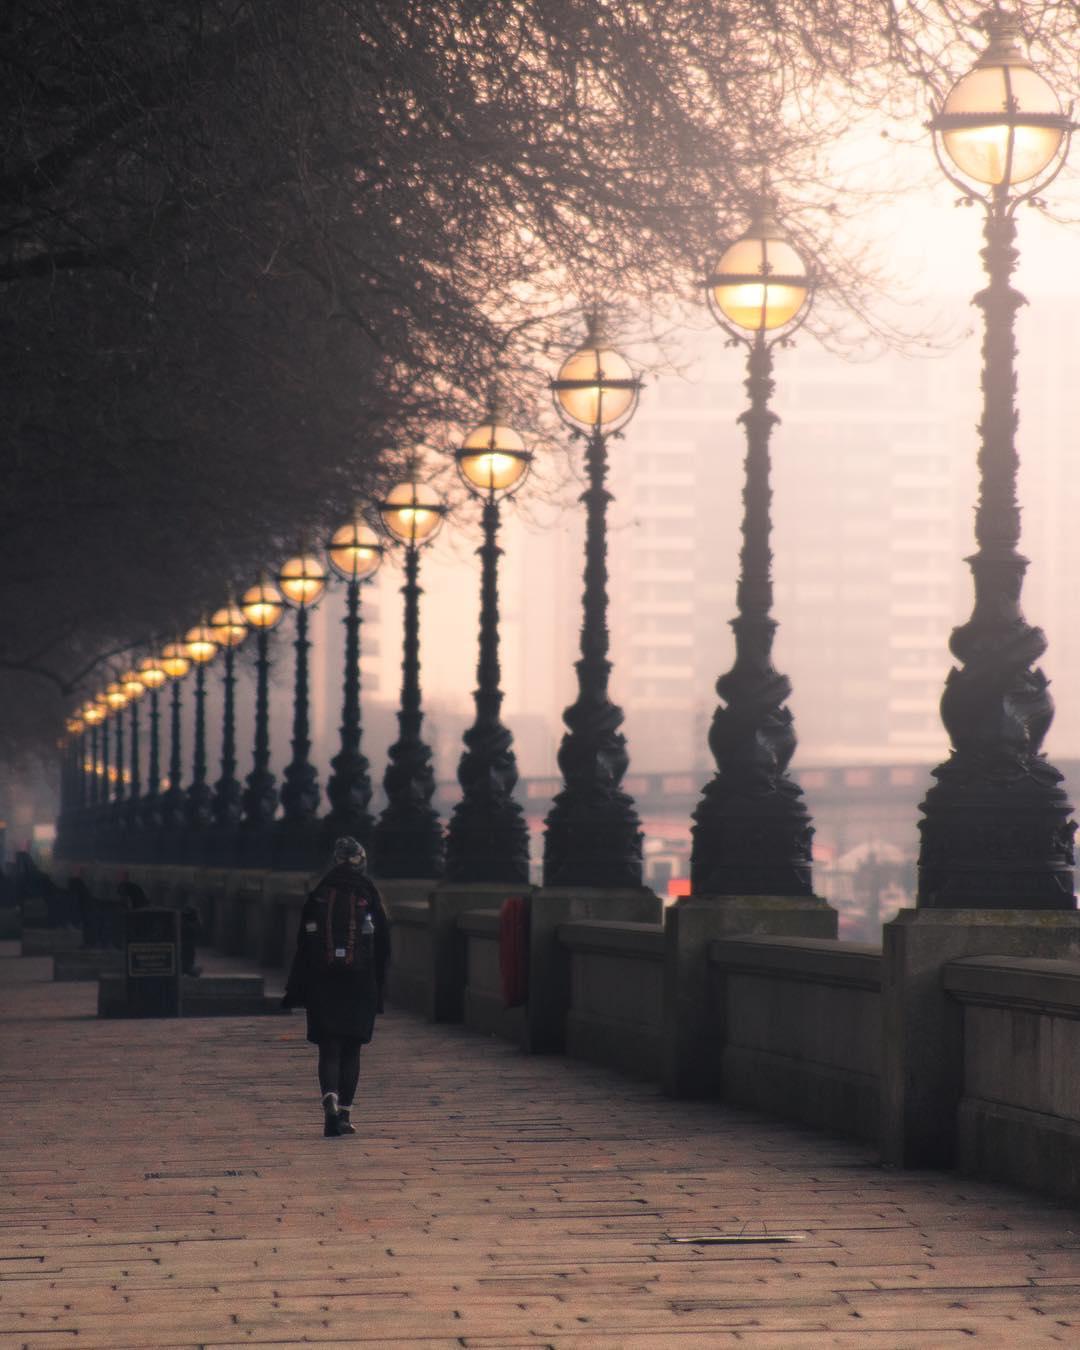 Autumn in London Thames photo.